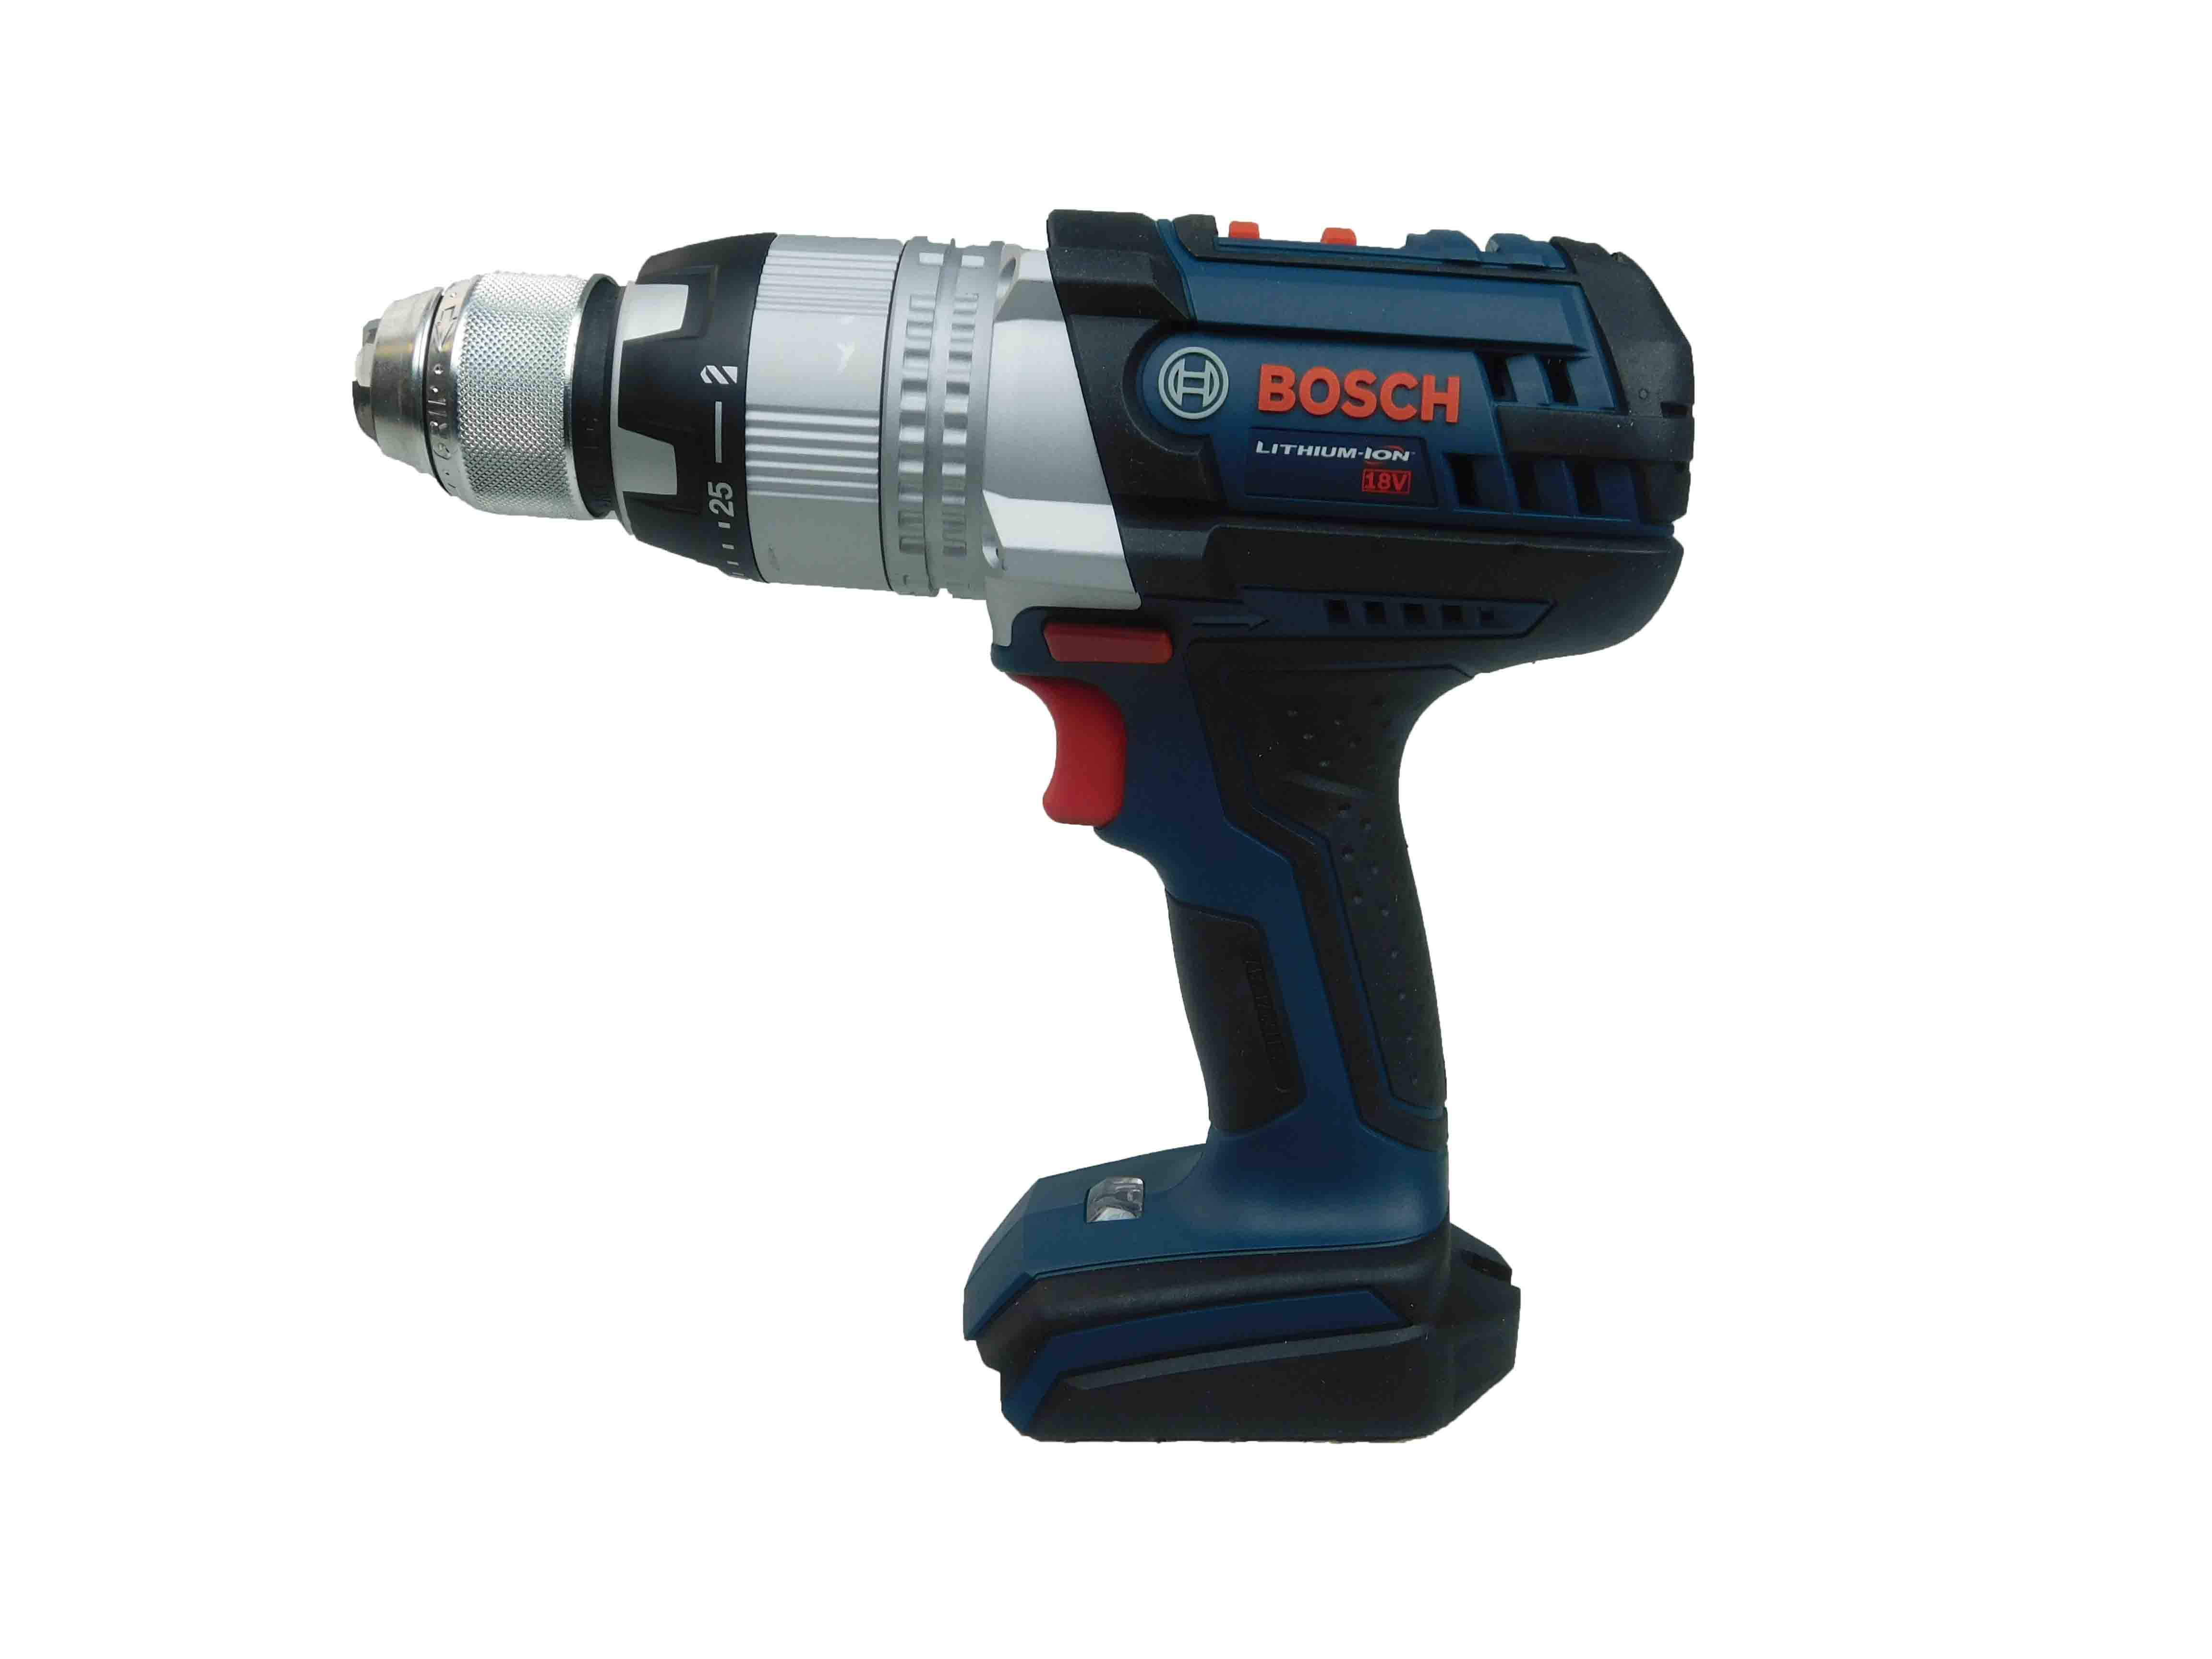 Bosch-HDH181XB18V-Brute-Tough-1-2-In.-Hammer-Drill-Driver-image-15